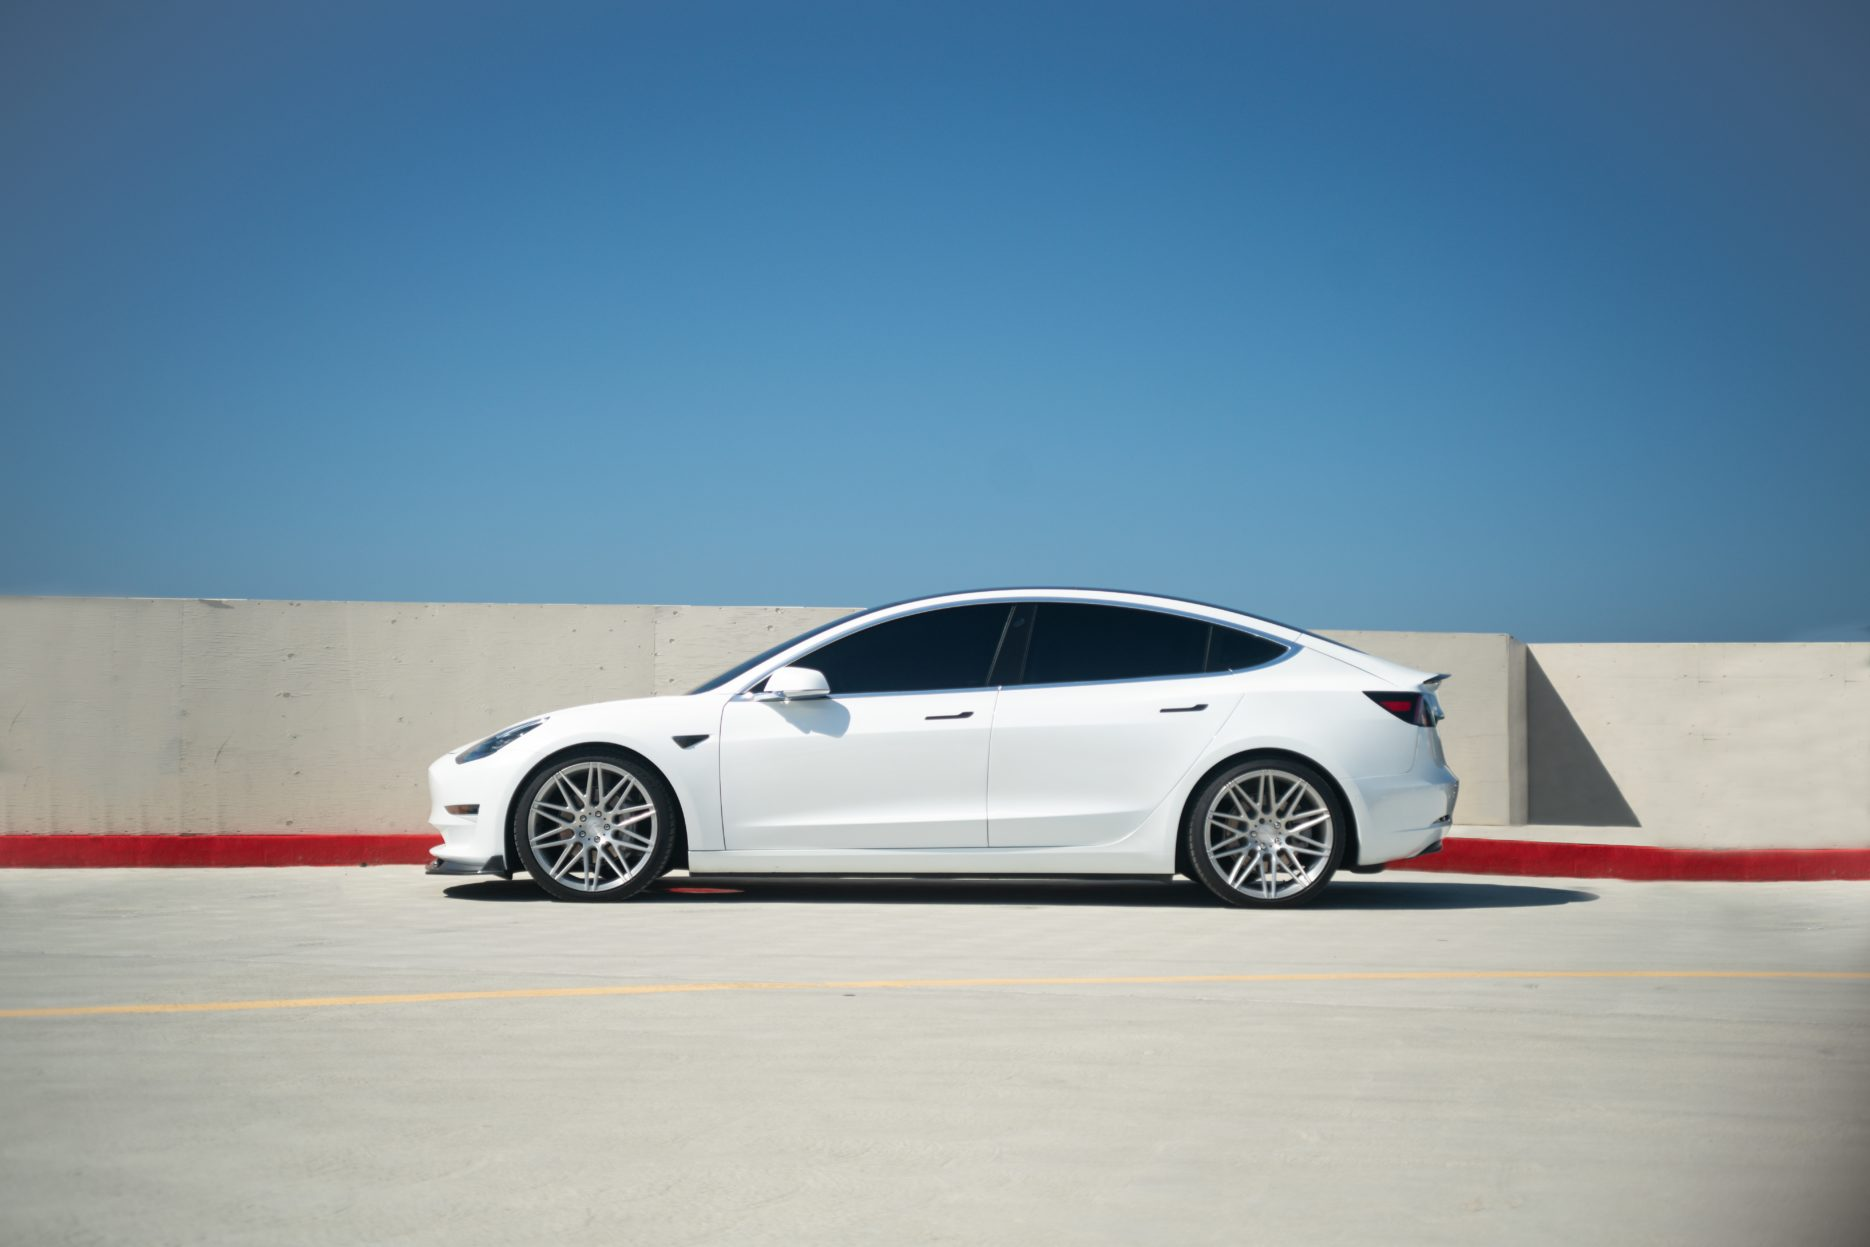 Electric vehicle. Credit: Unsplash